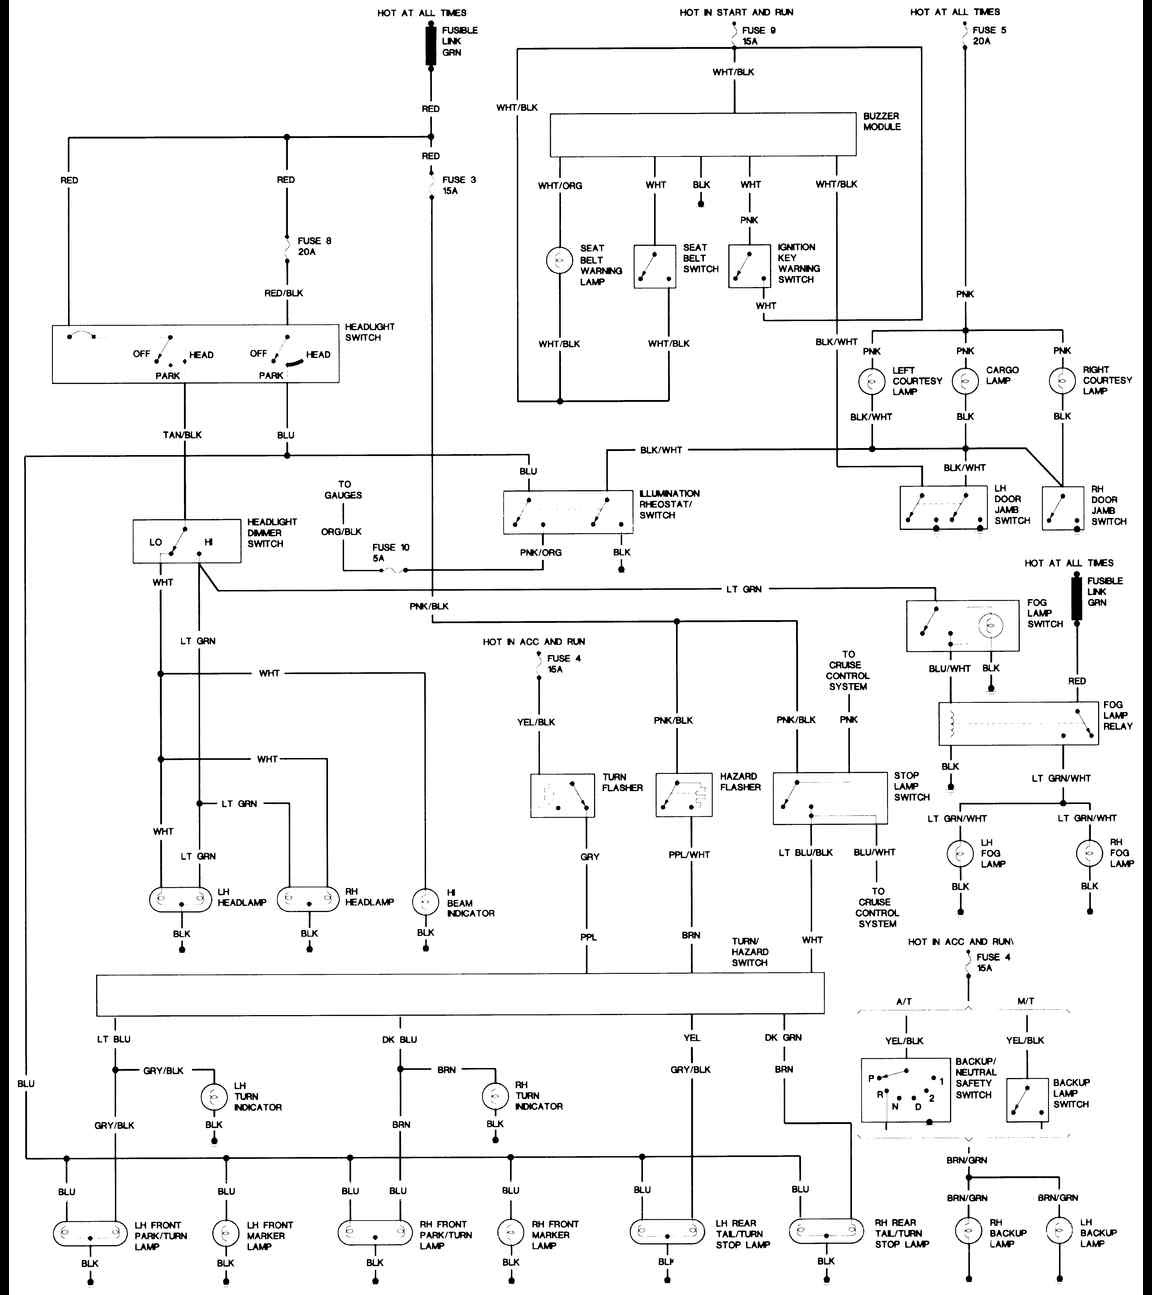 85 Jeep Wiring Diagram Full Hd Version Wiring Diagram Loeb Diagram Scacchicavarzere It